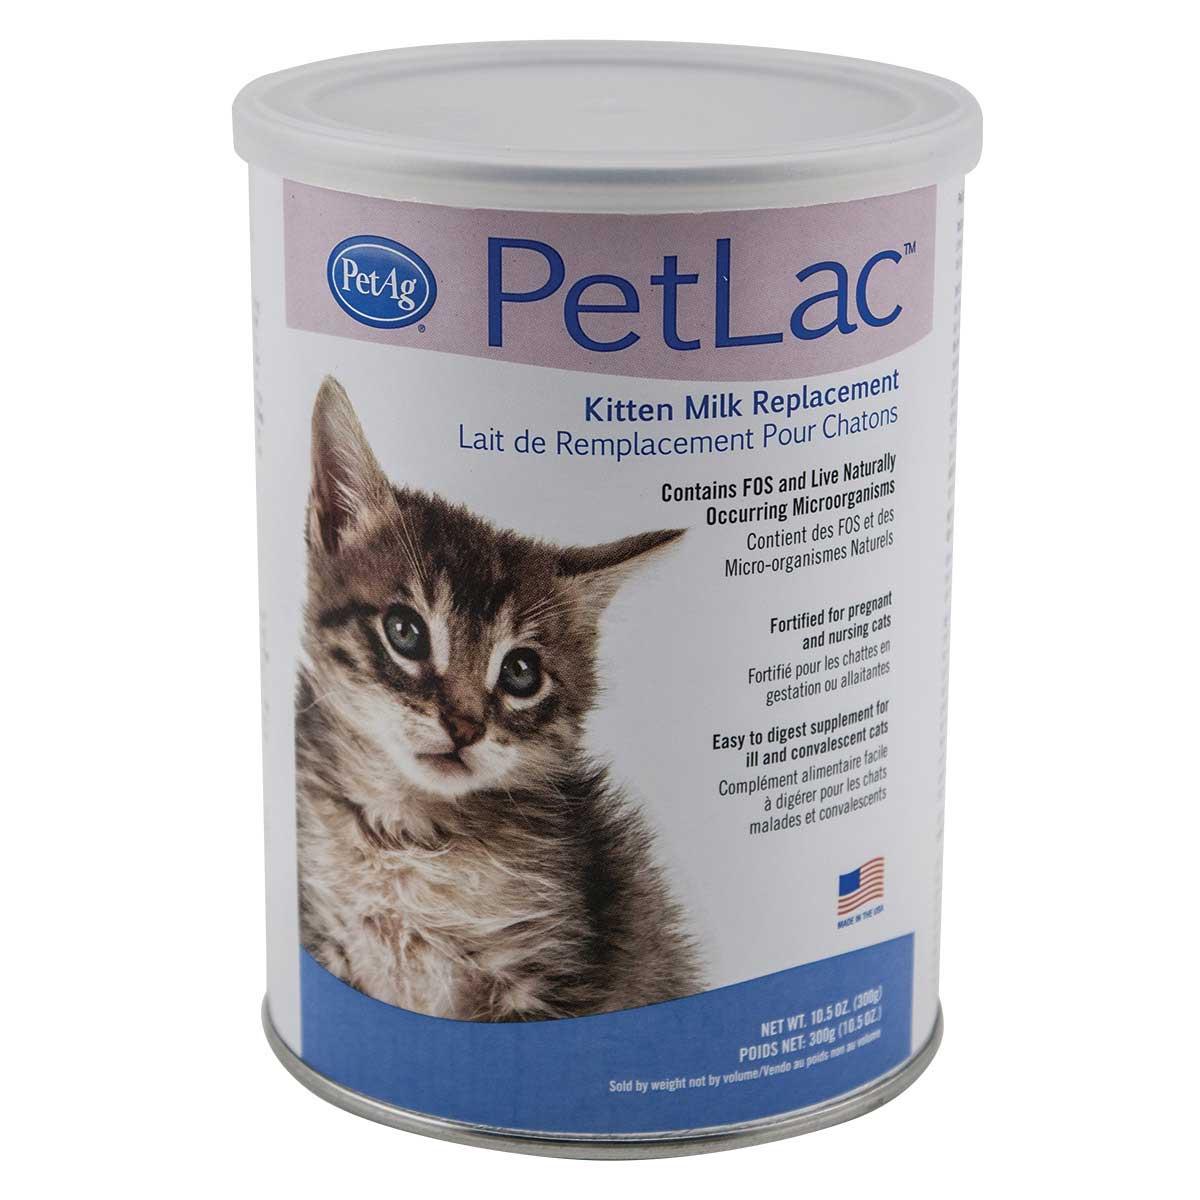 PetAg PetLac Powder For Kittens 10.5 oz - Milk Replacement